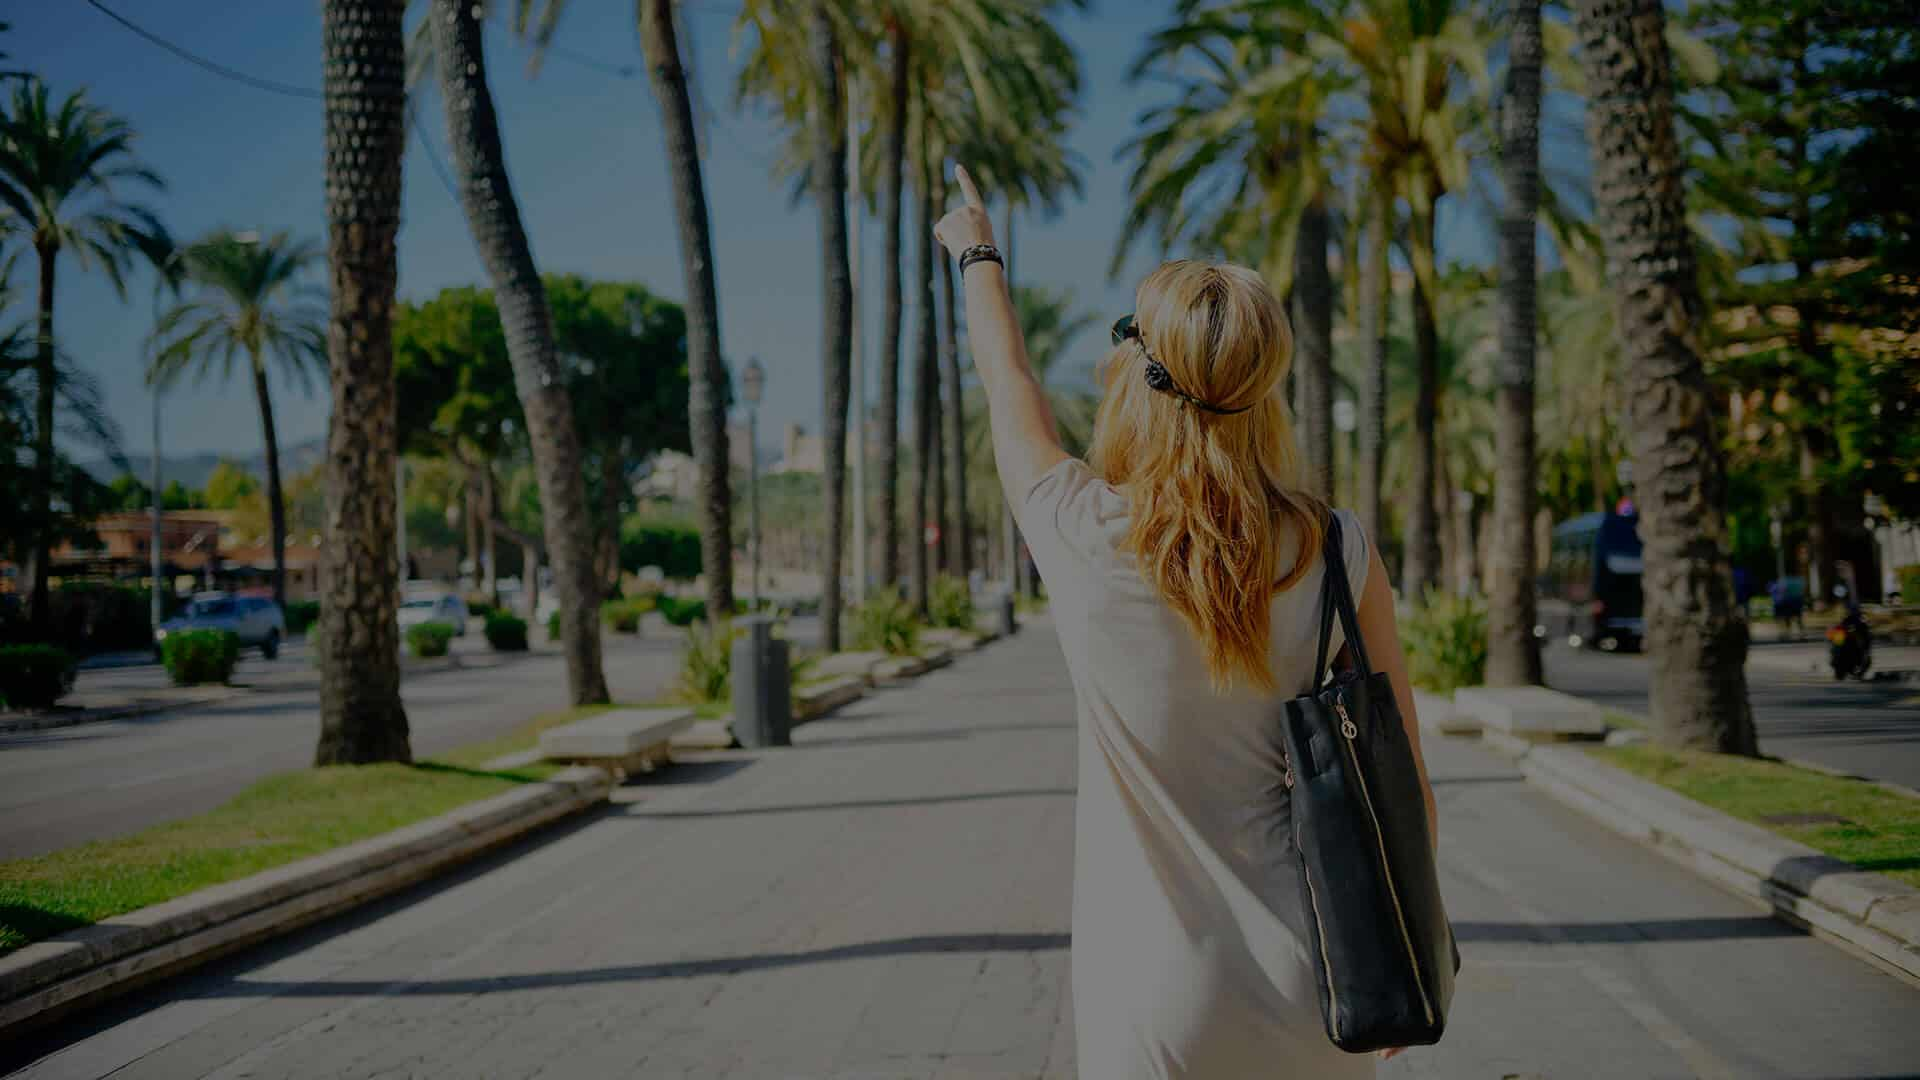 apparel e-commerce startup